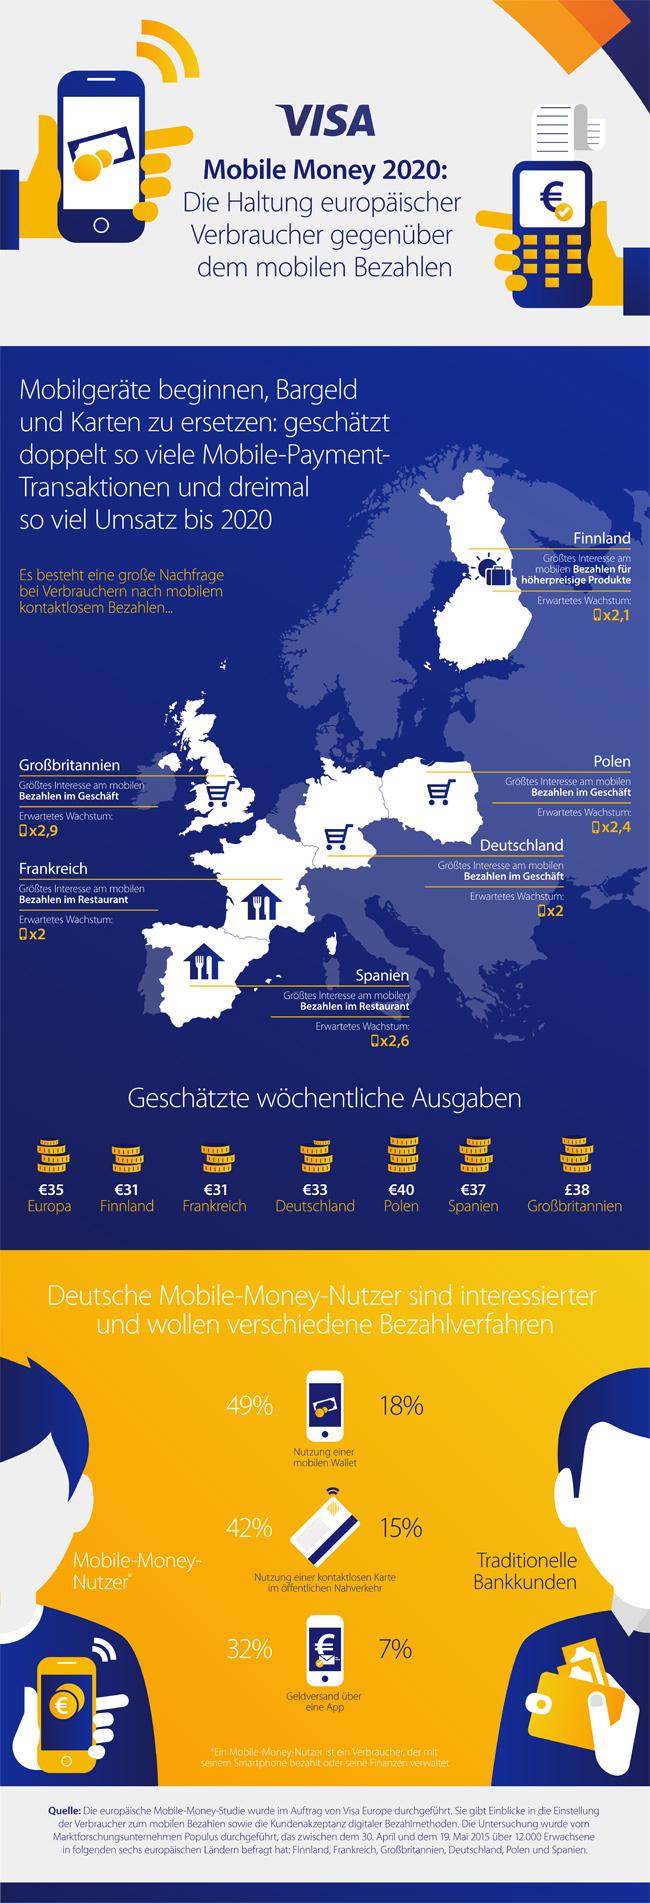 Einstellung europäischer Konsumenten zum Mobile Payment